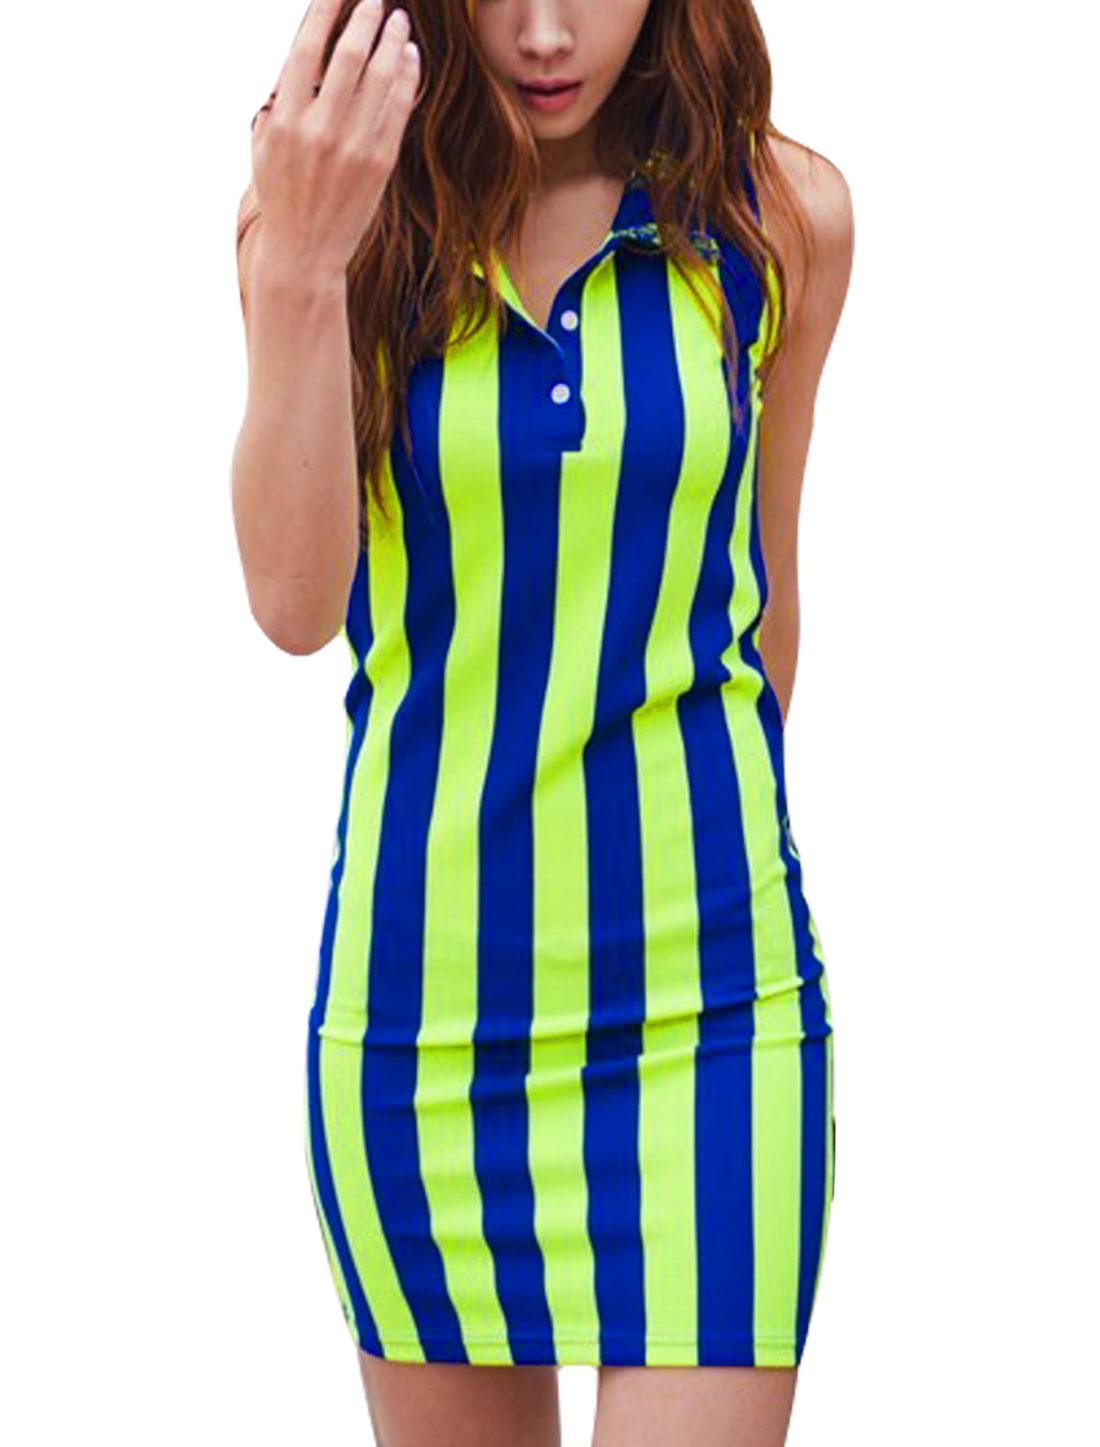 Women Stripes Sleeveless Point Collar Pattern Stretchy Dress Blue Lime Xs